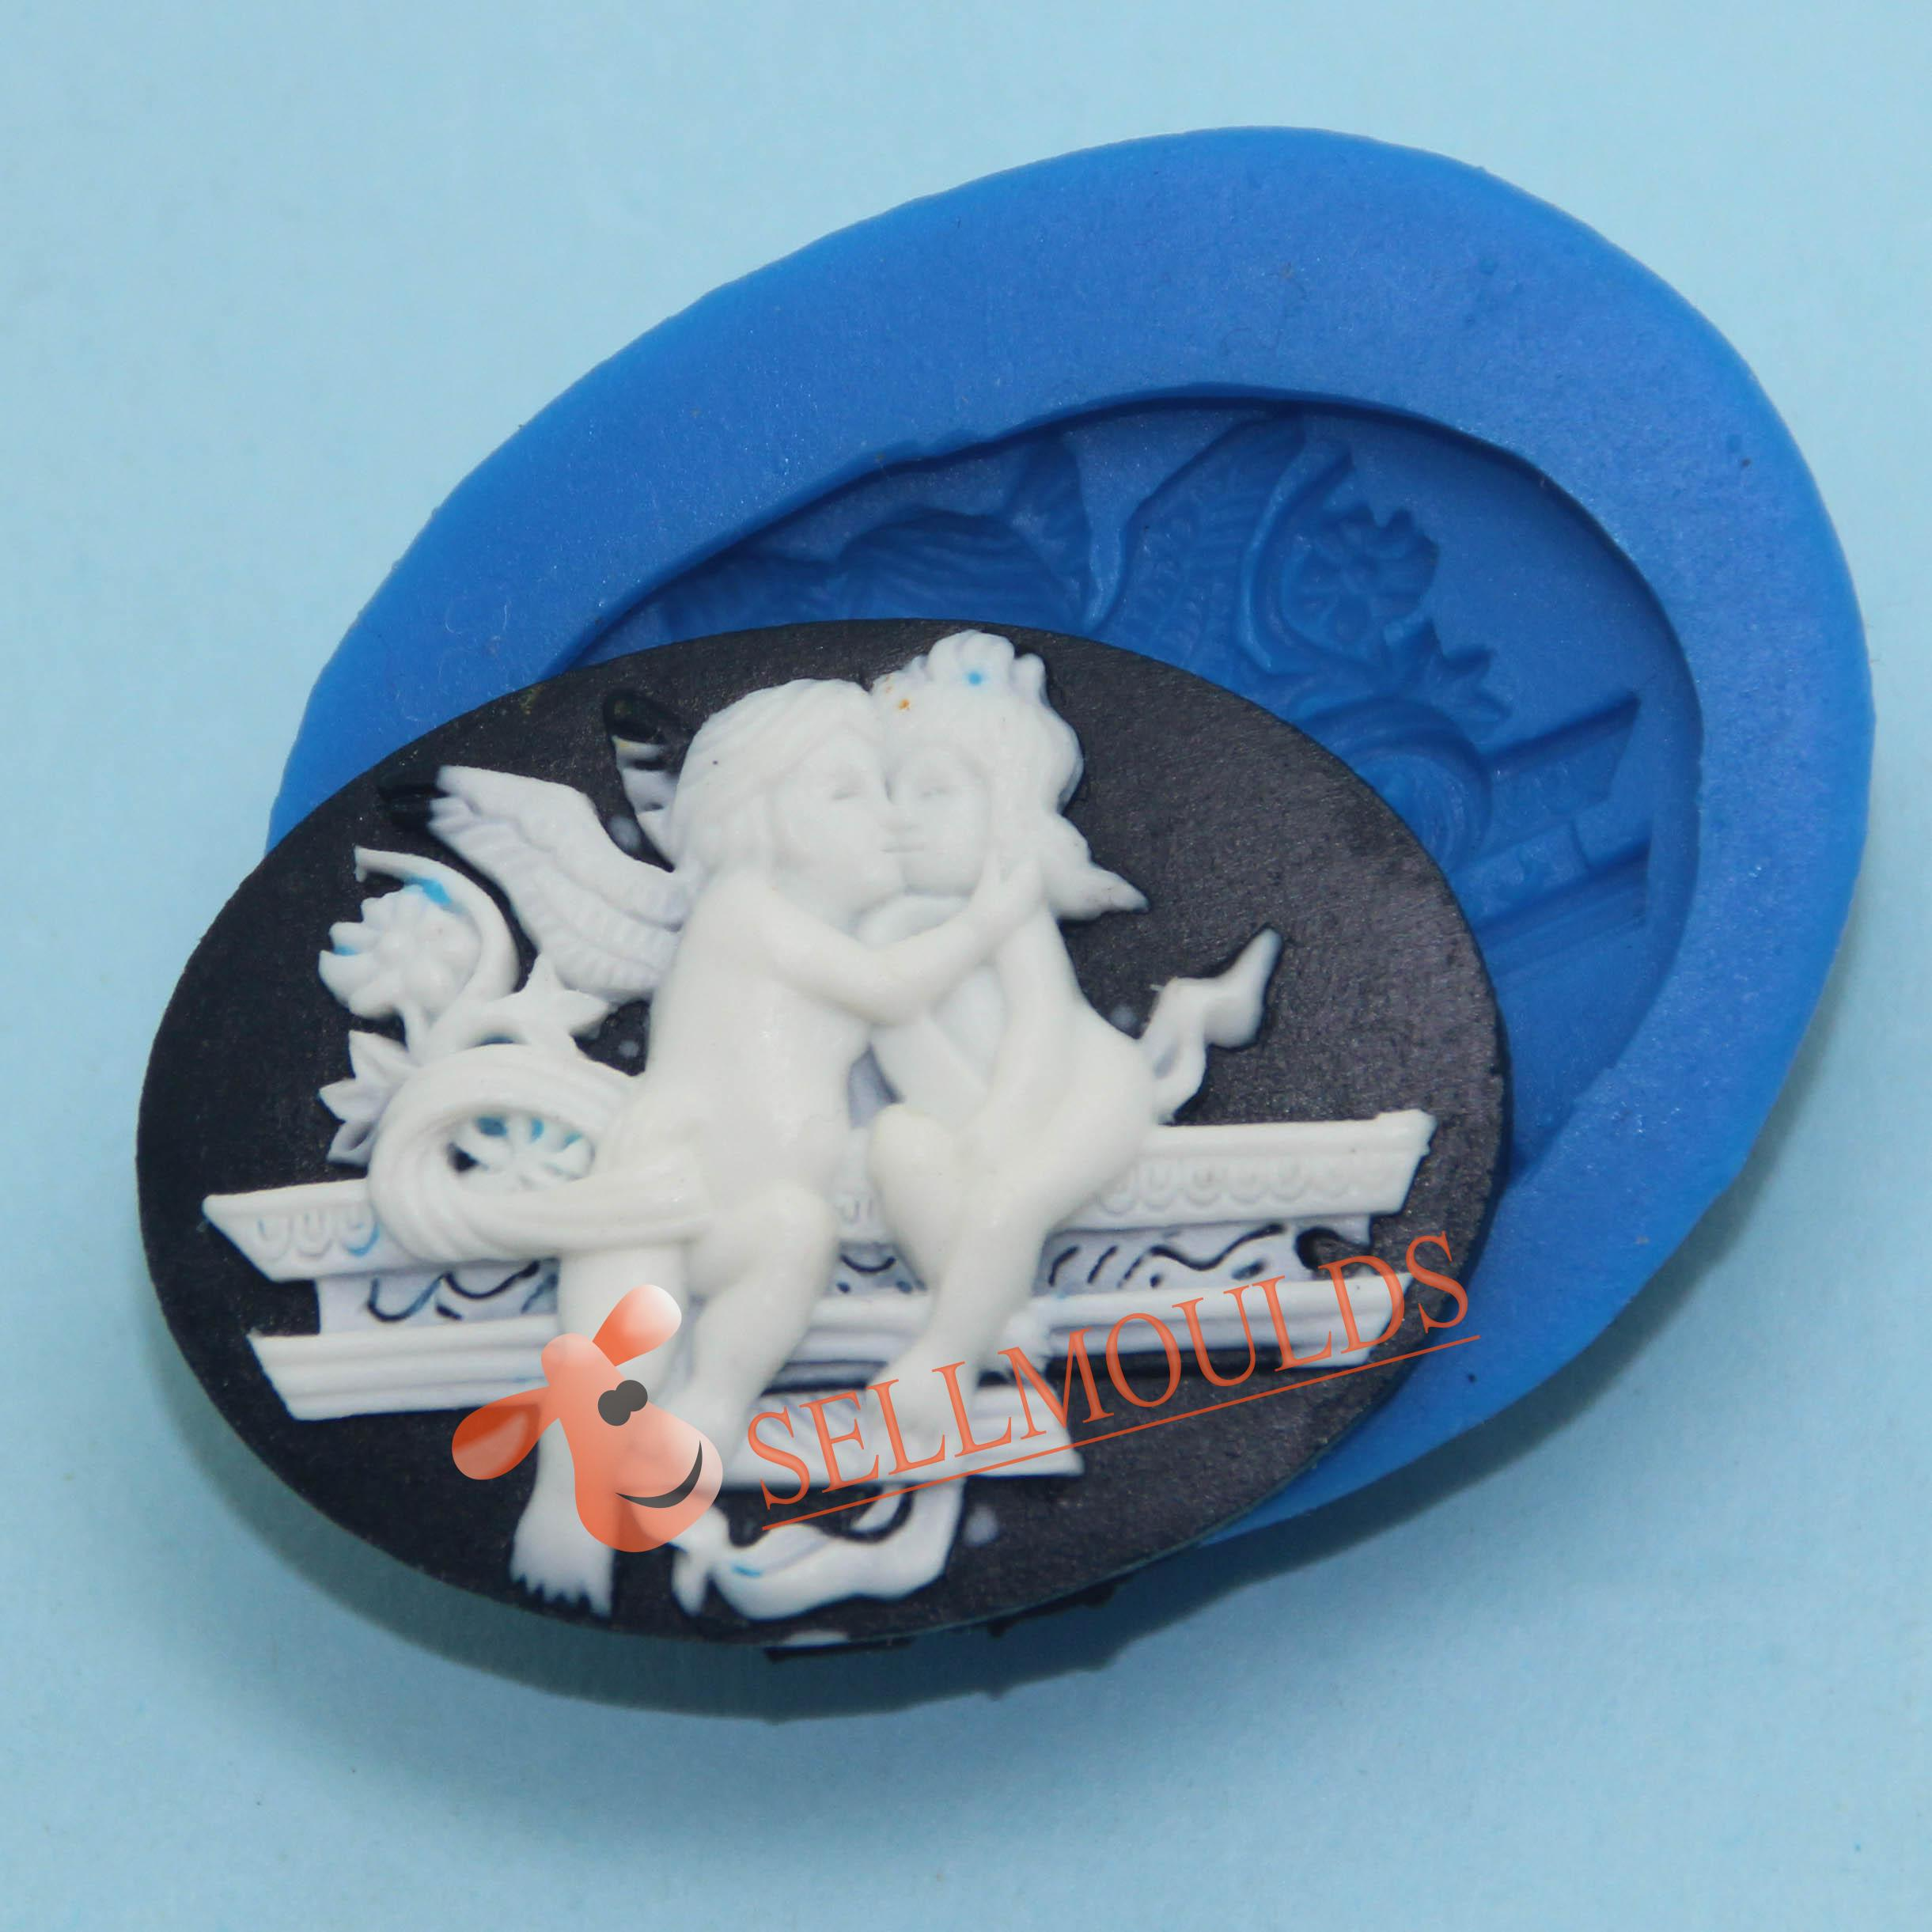 New Girl and Boy Craft Art Silicone Cookie mold Craft Molds DIY Handmade molds Wedding Kiss(China (Mainland))